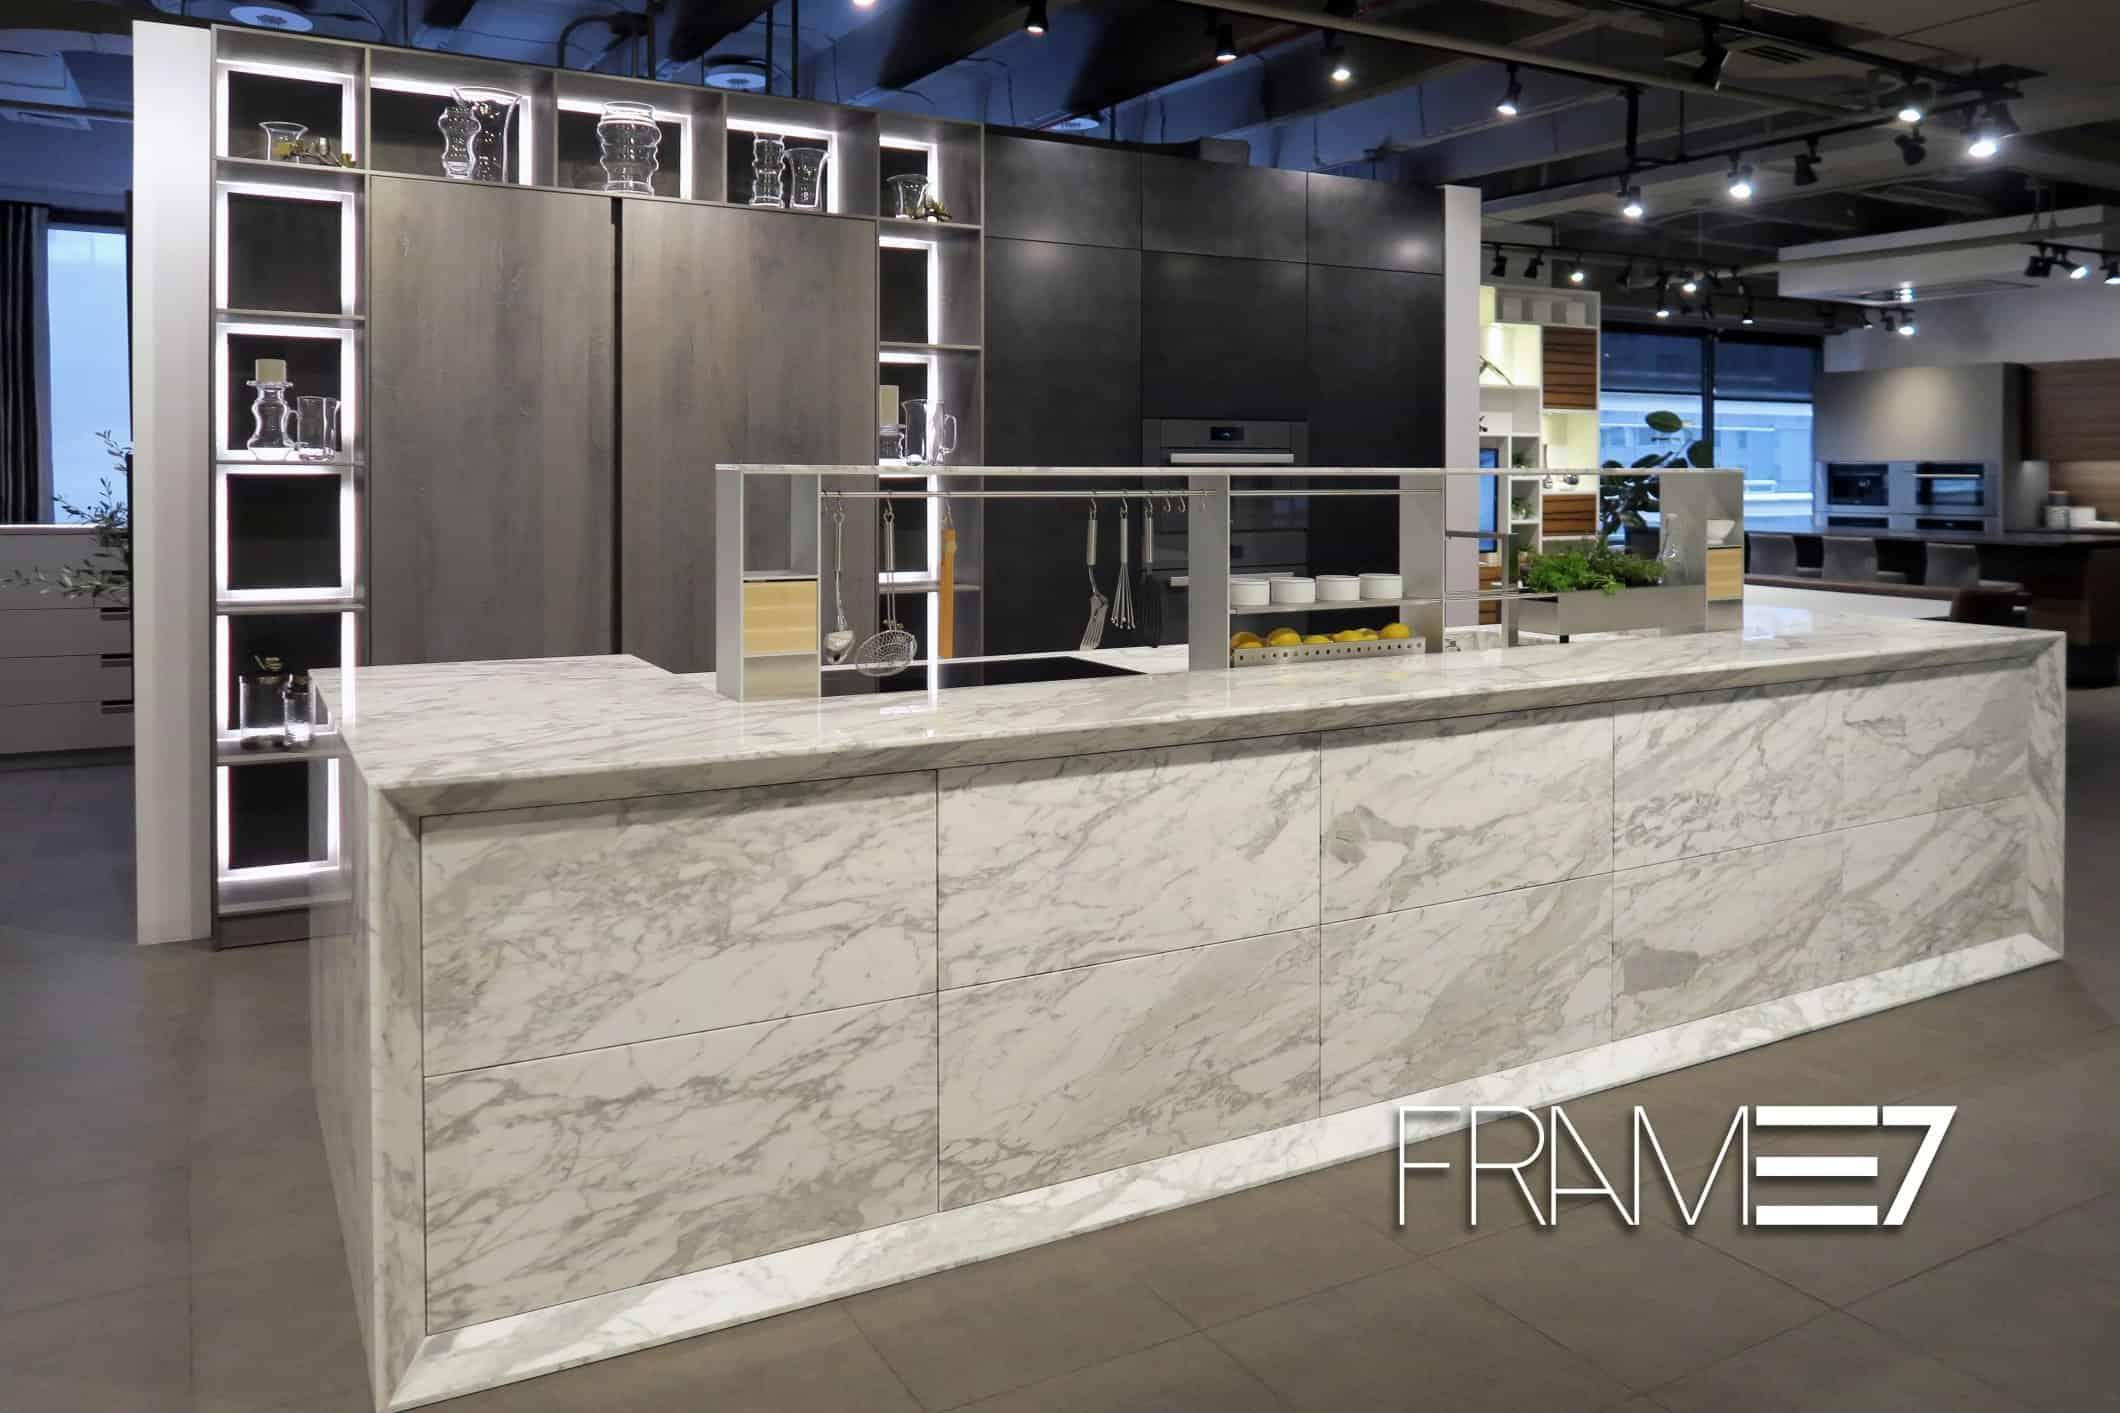 eggersmann launches FRAME7 innovation & rocks the kitchen world